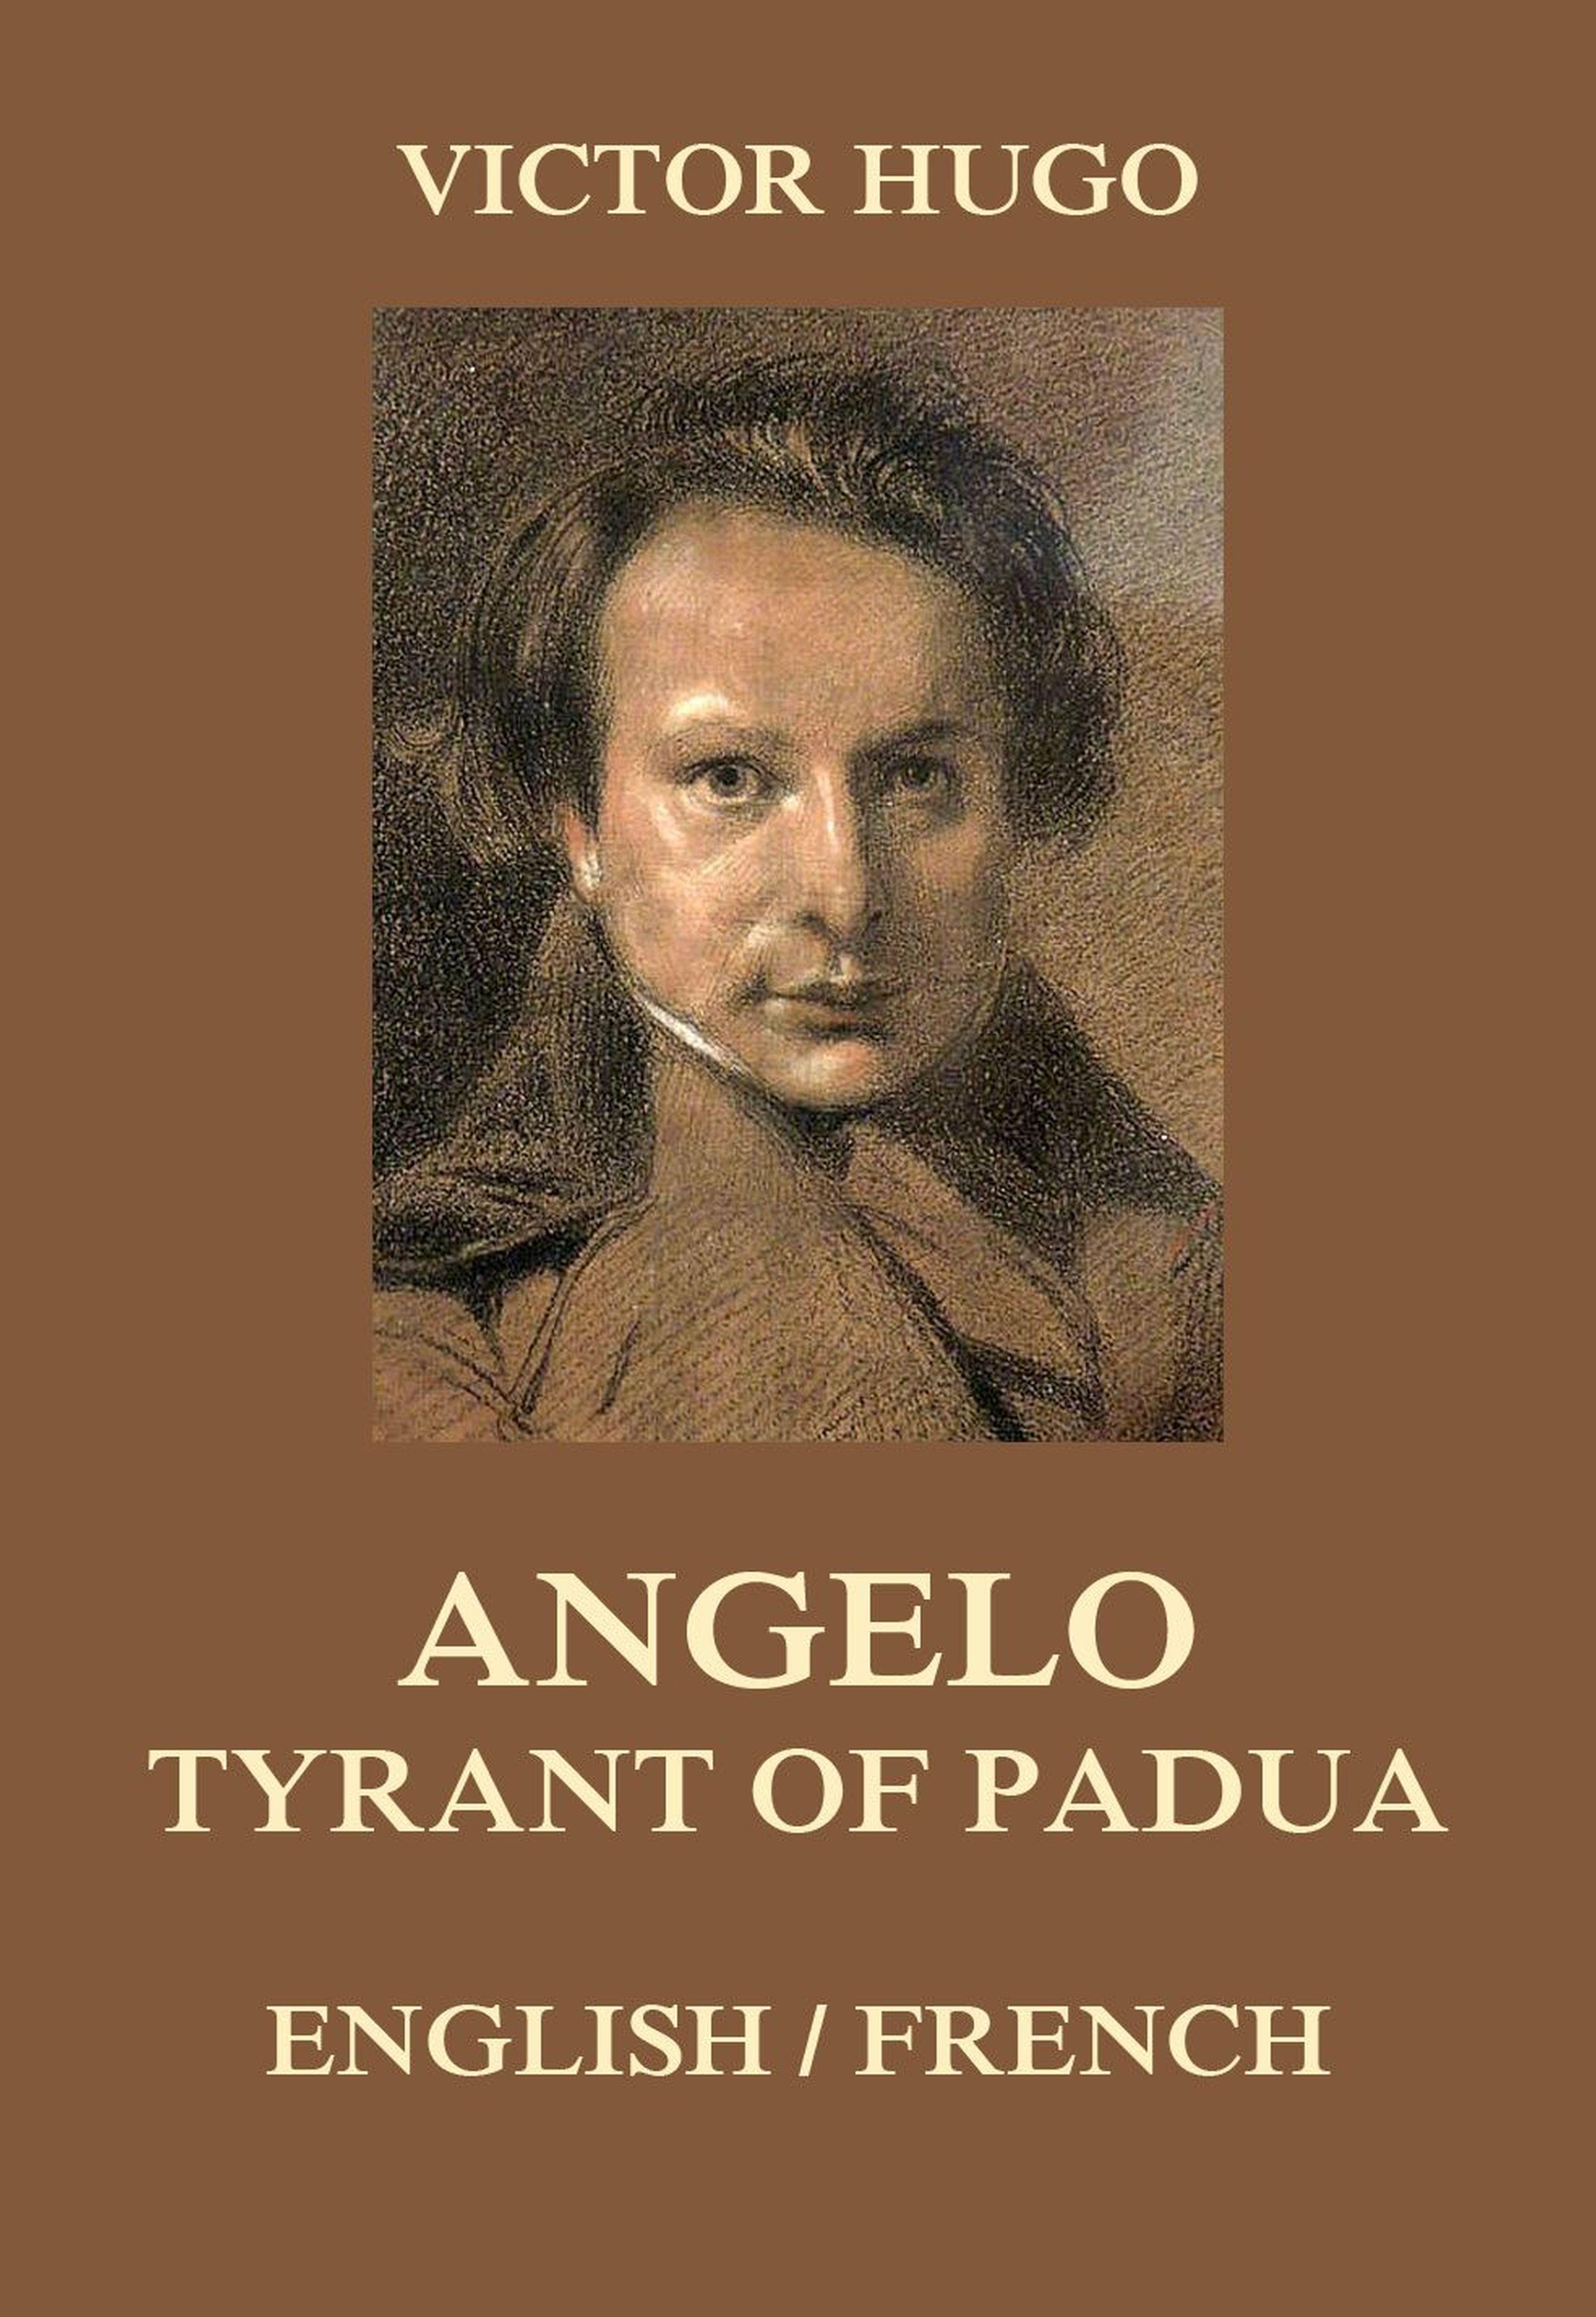 цена на Виктор Мари Гюго Angelo, Tyrant of Padua